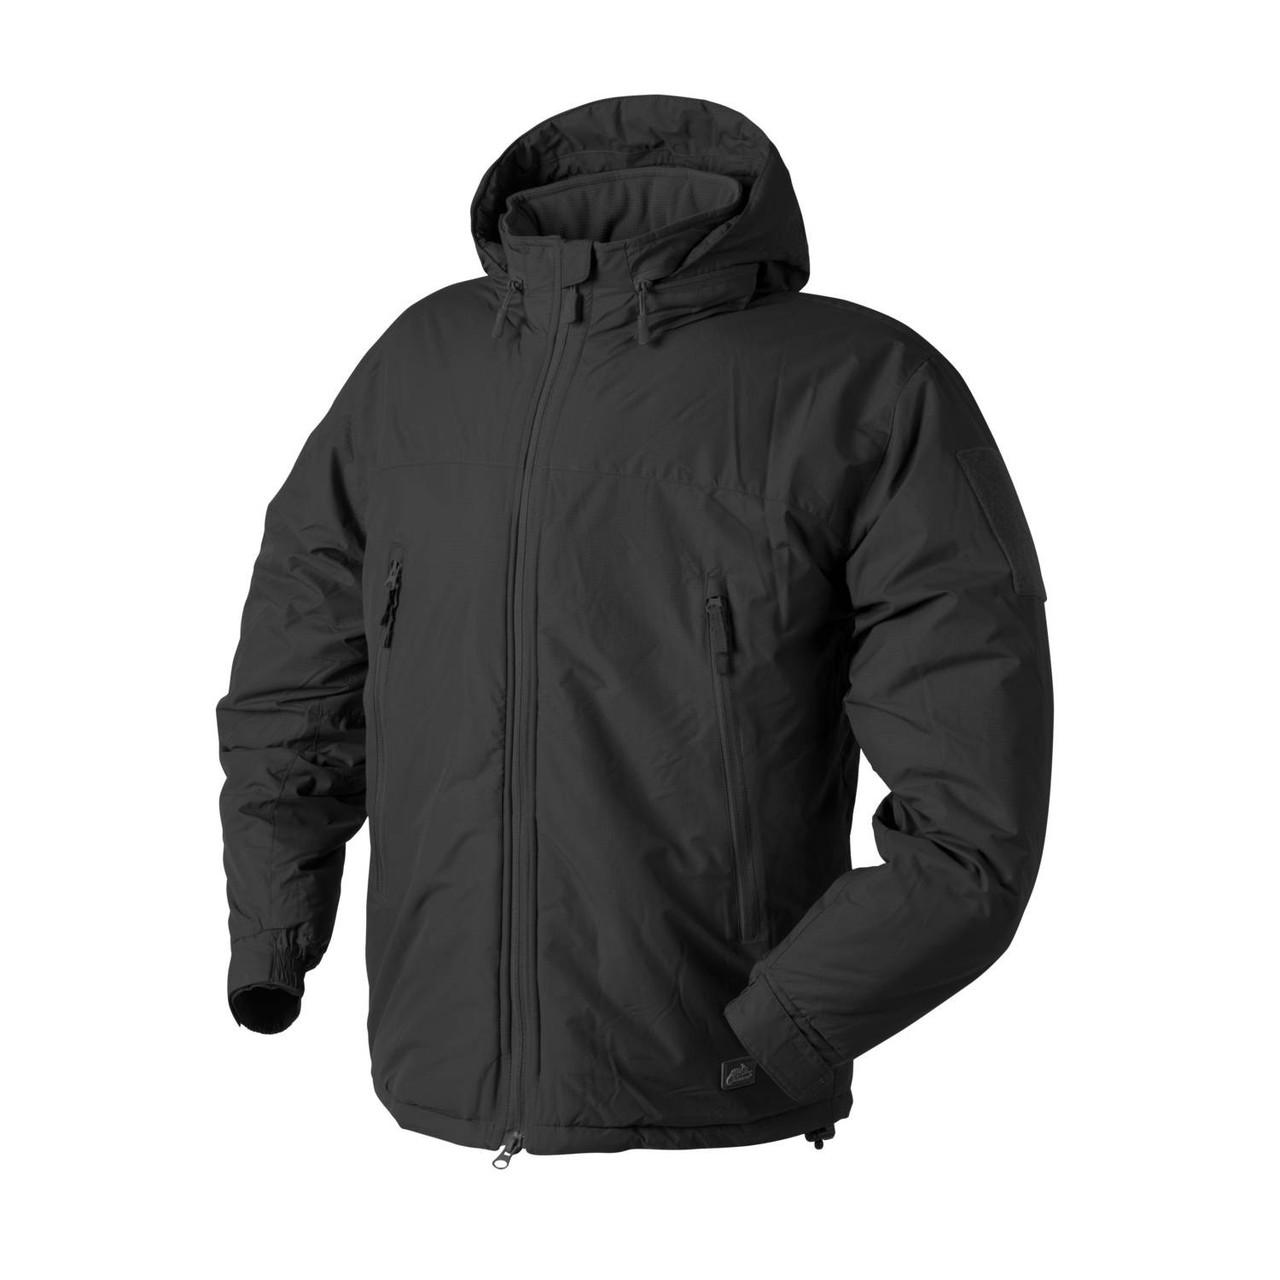 Куртка Helikon-Tex Level 7 Winter Black Jacket (KU-L70-NL-01)